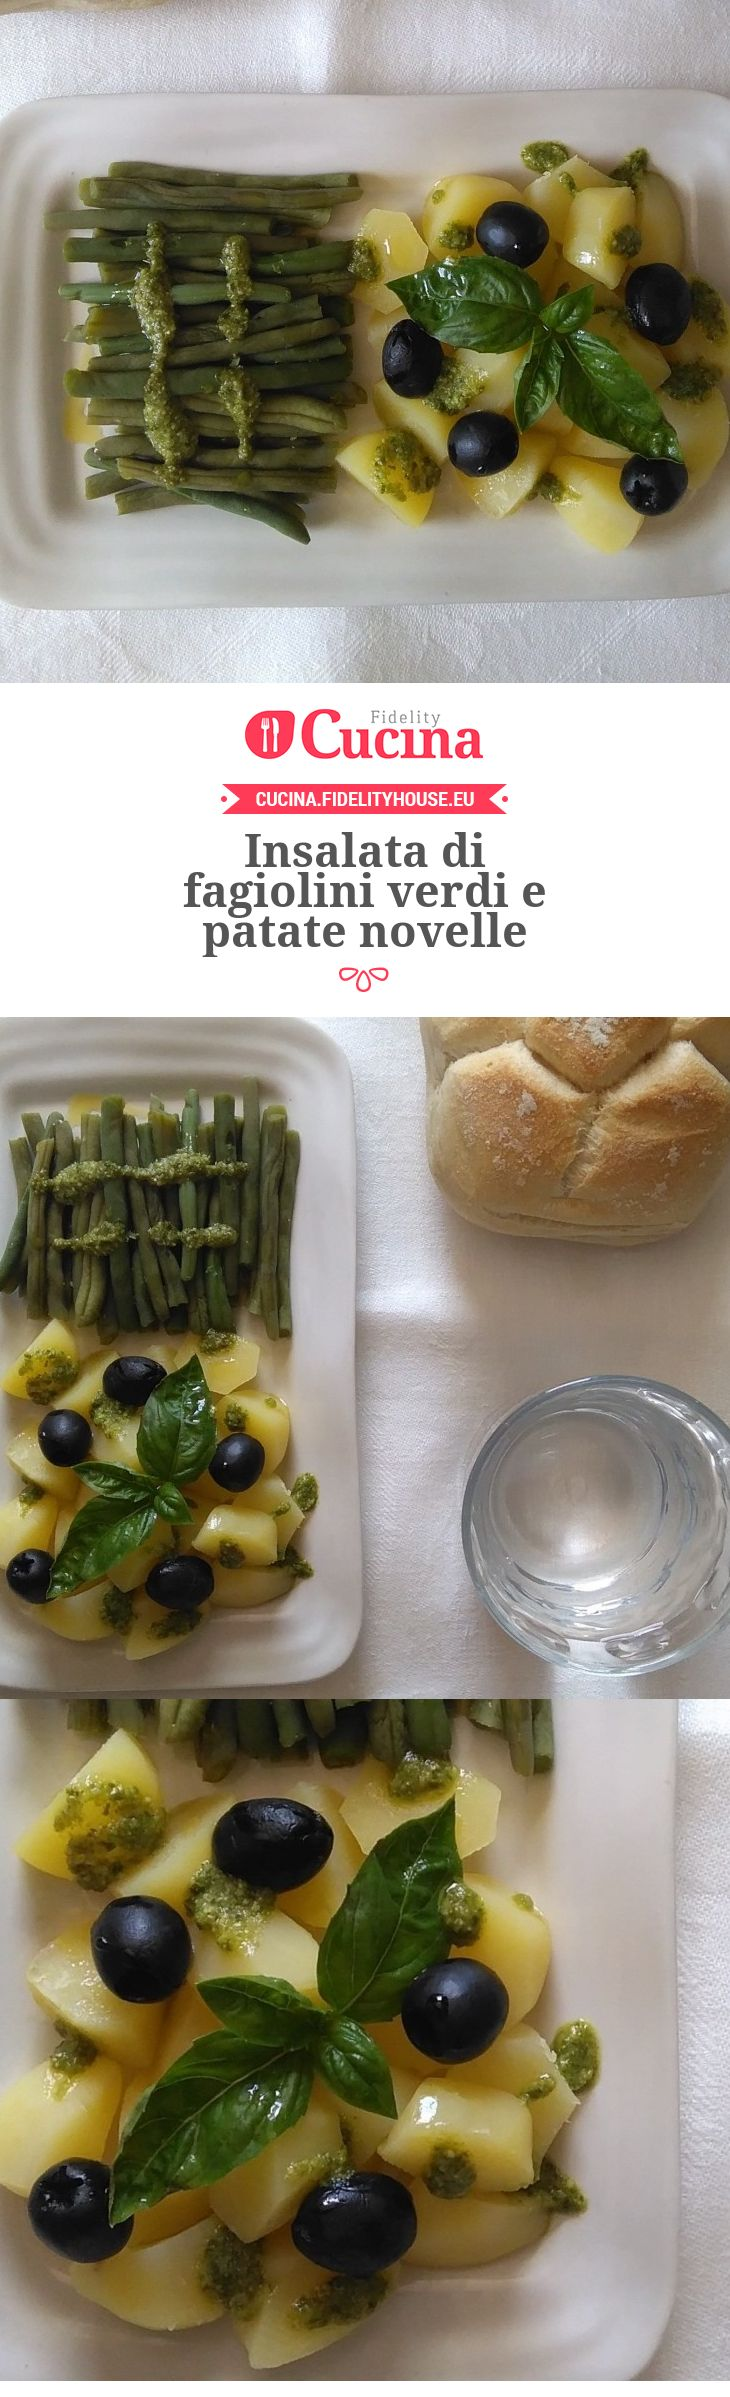 Insalata di fagiolini verdi e patate novelle